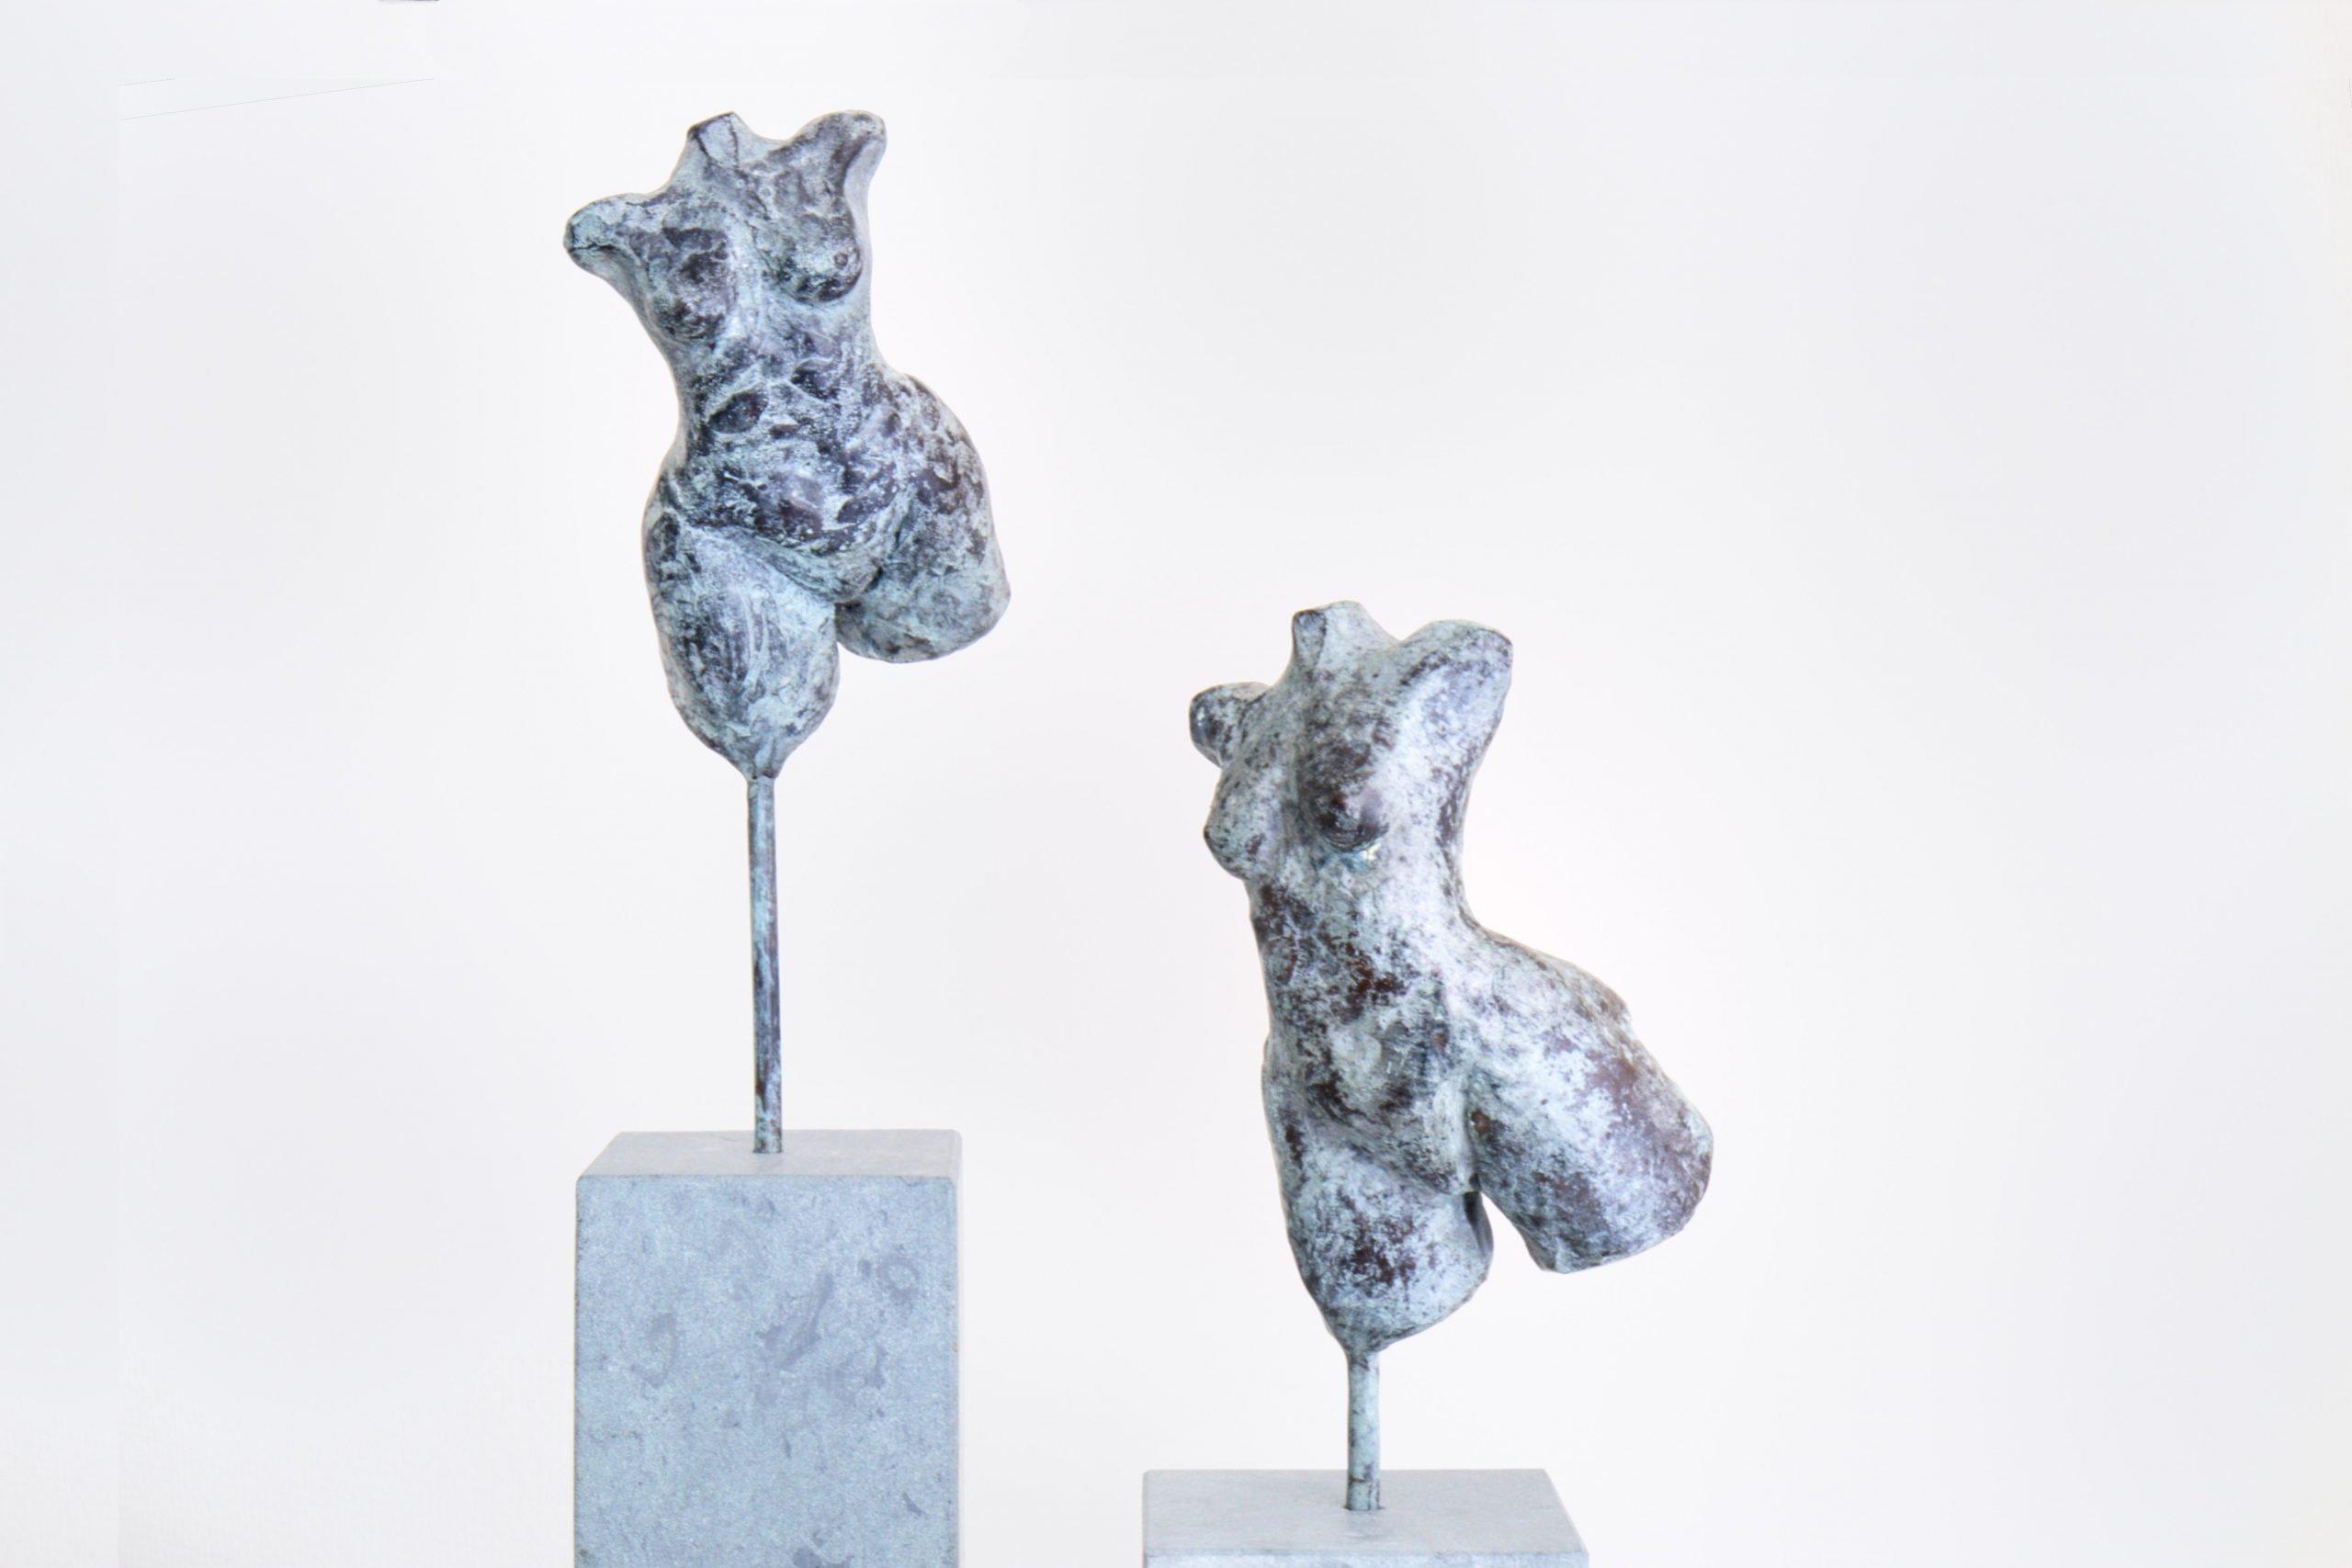 Atelier Hester Glasbergen